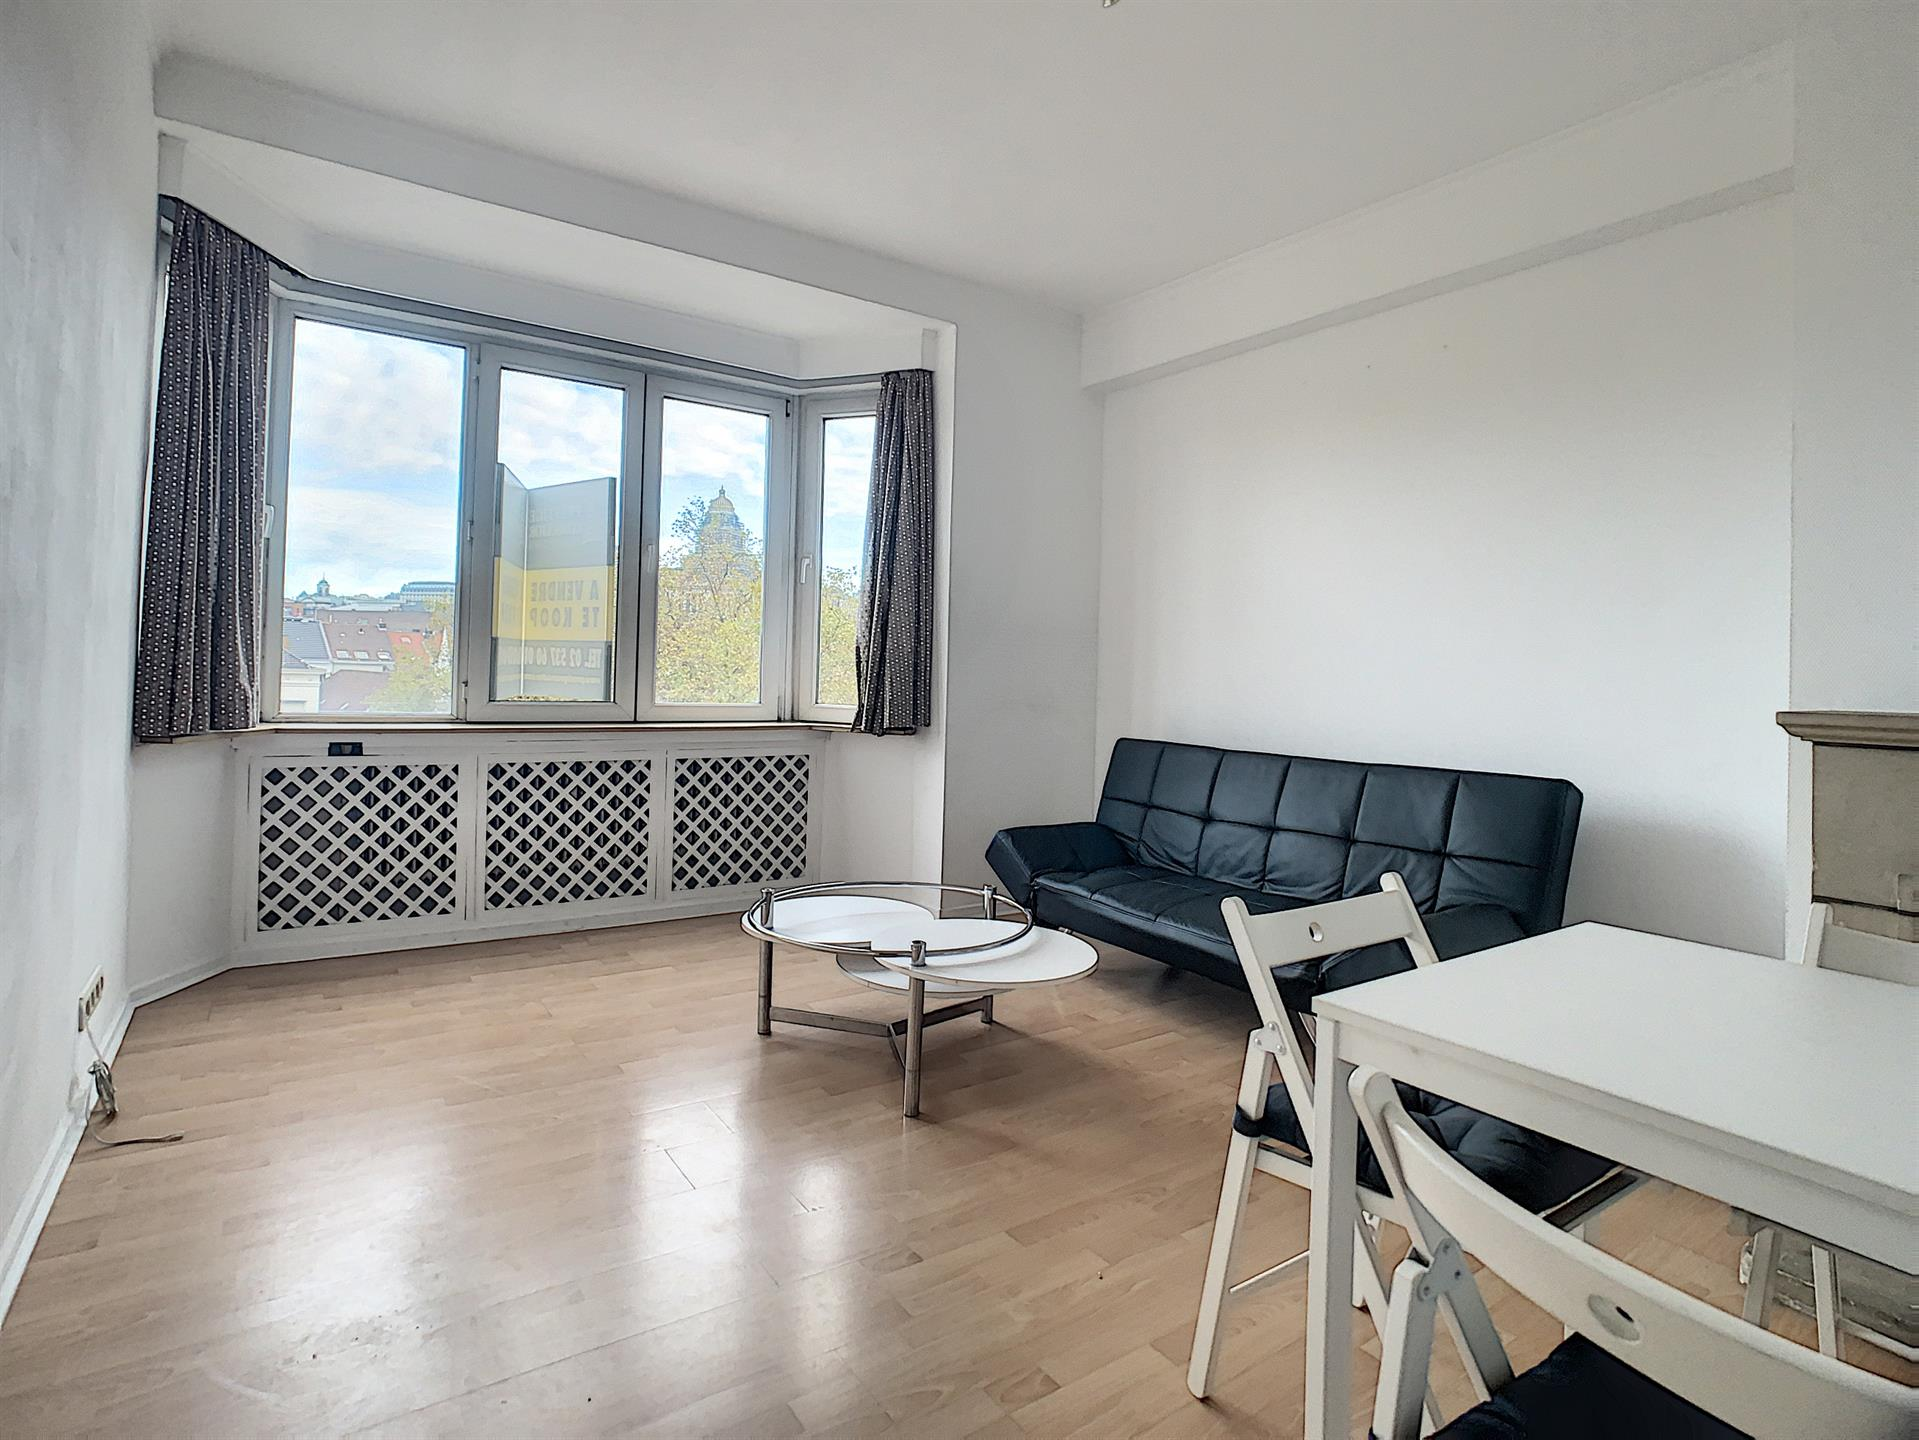 Appartement - Sint-Gillis - #4202152-1